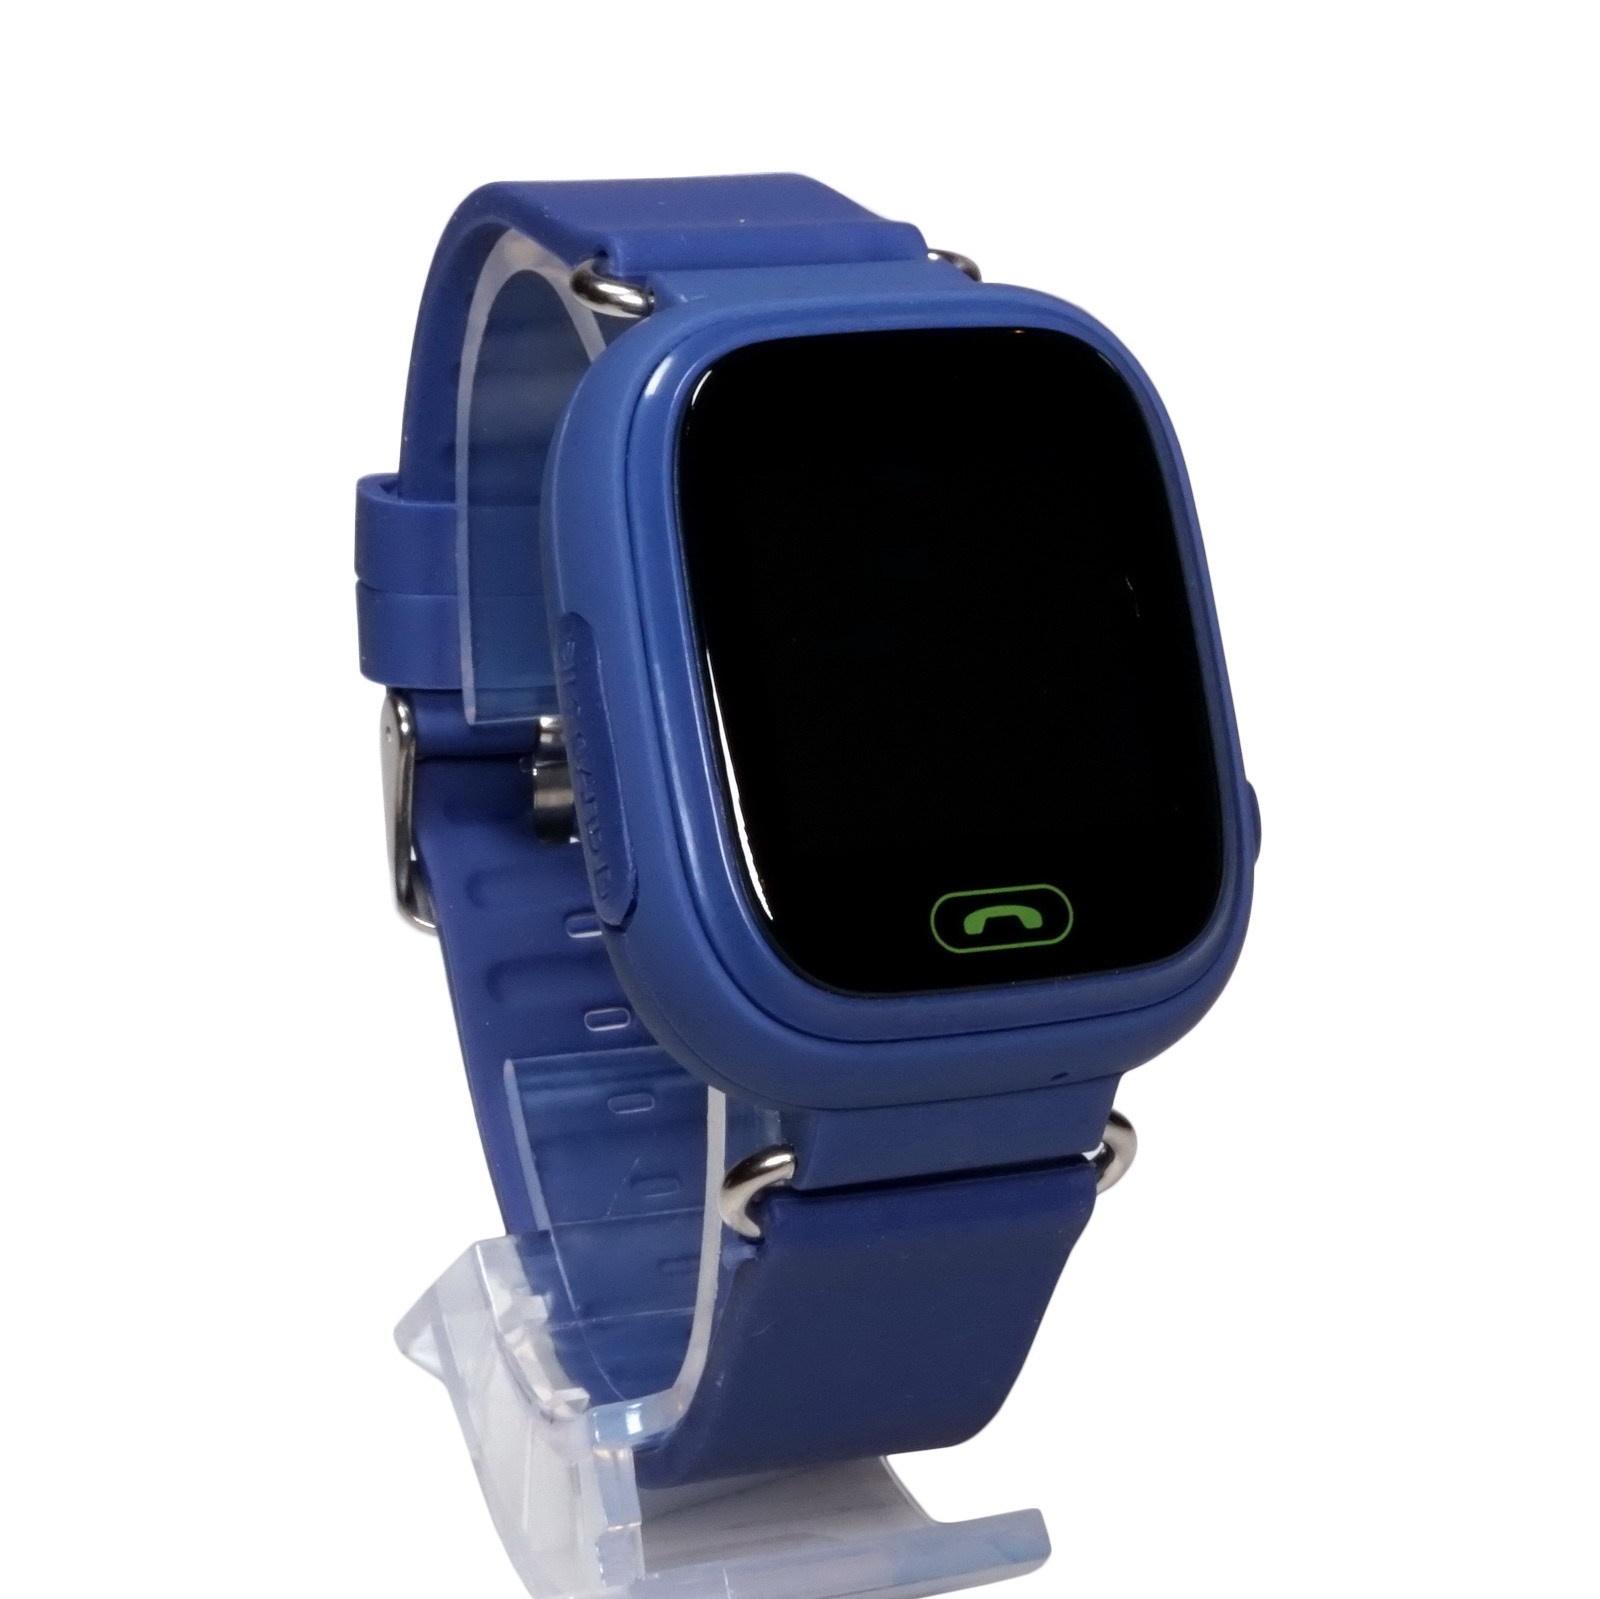 Часы Smart Baby Watch Q90 с сенсорным экраном - Синие q100 q750 smart watch phone baby children kids gps tracker 1 54 touch screen wifi location sos anti lost device safe pk q50 q90